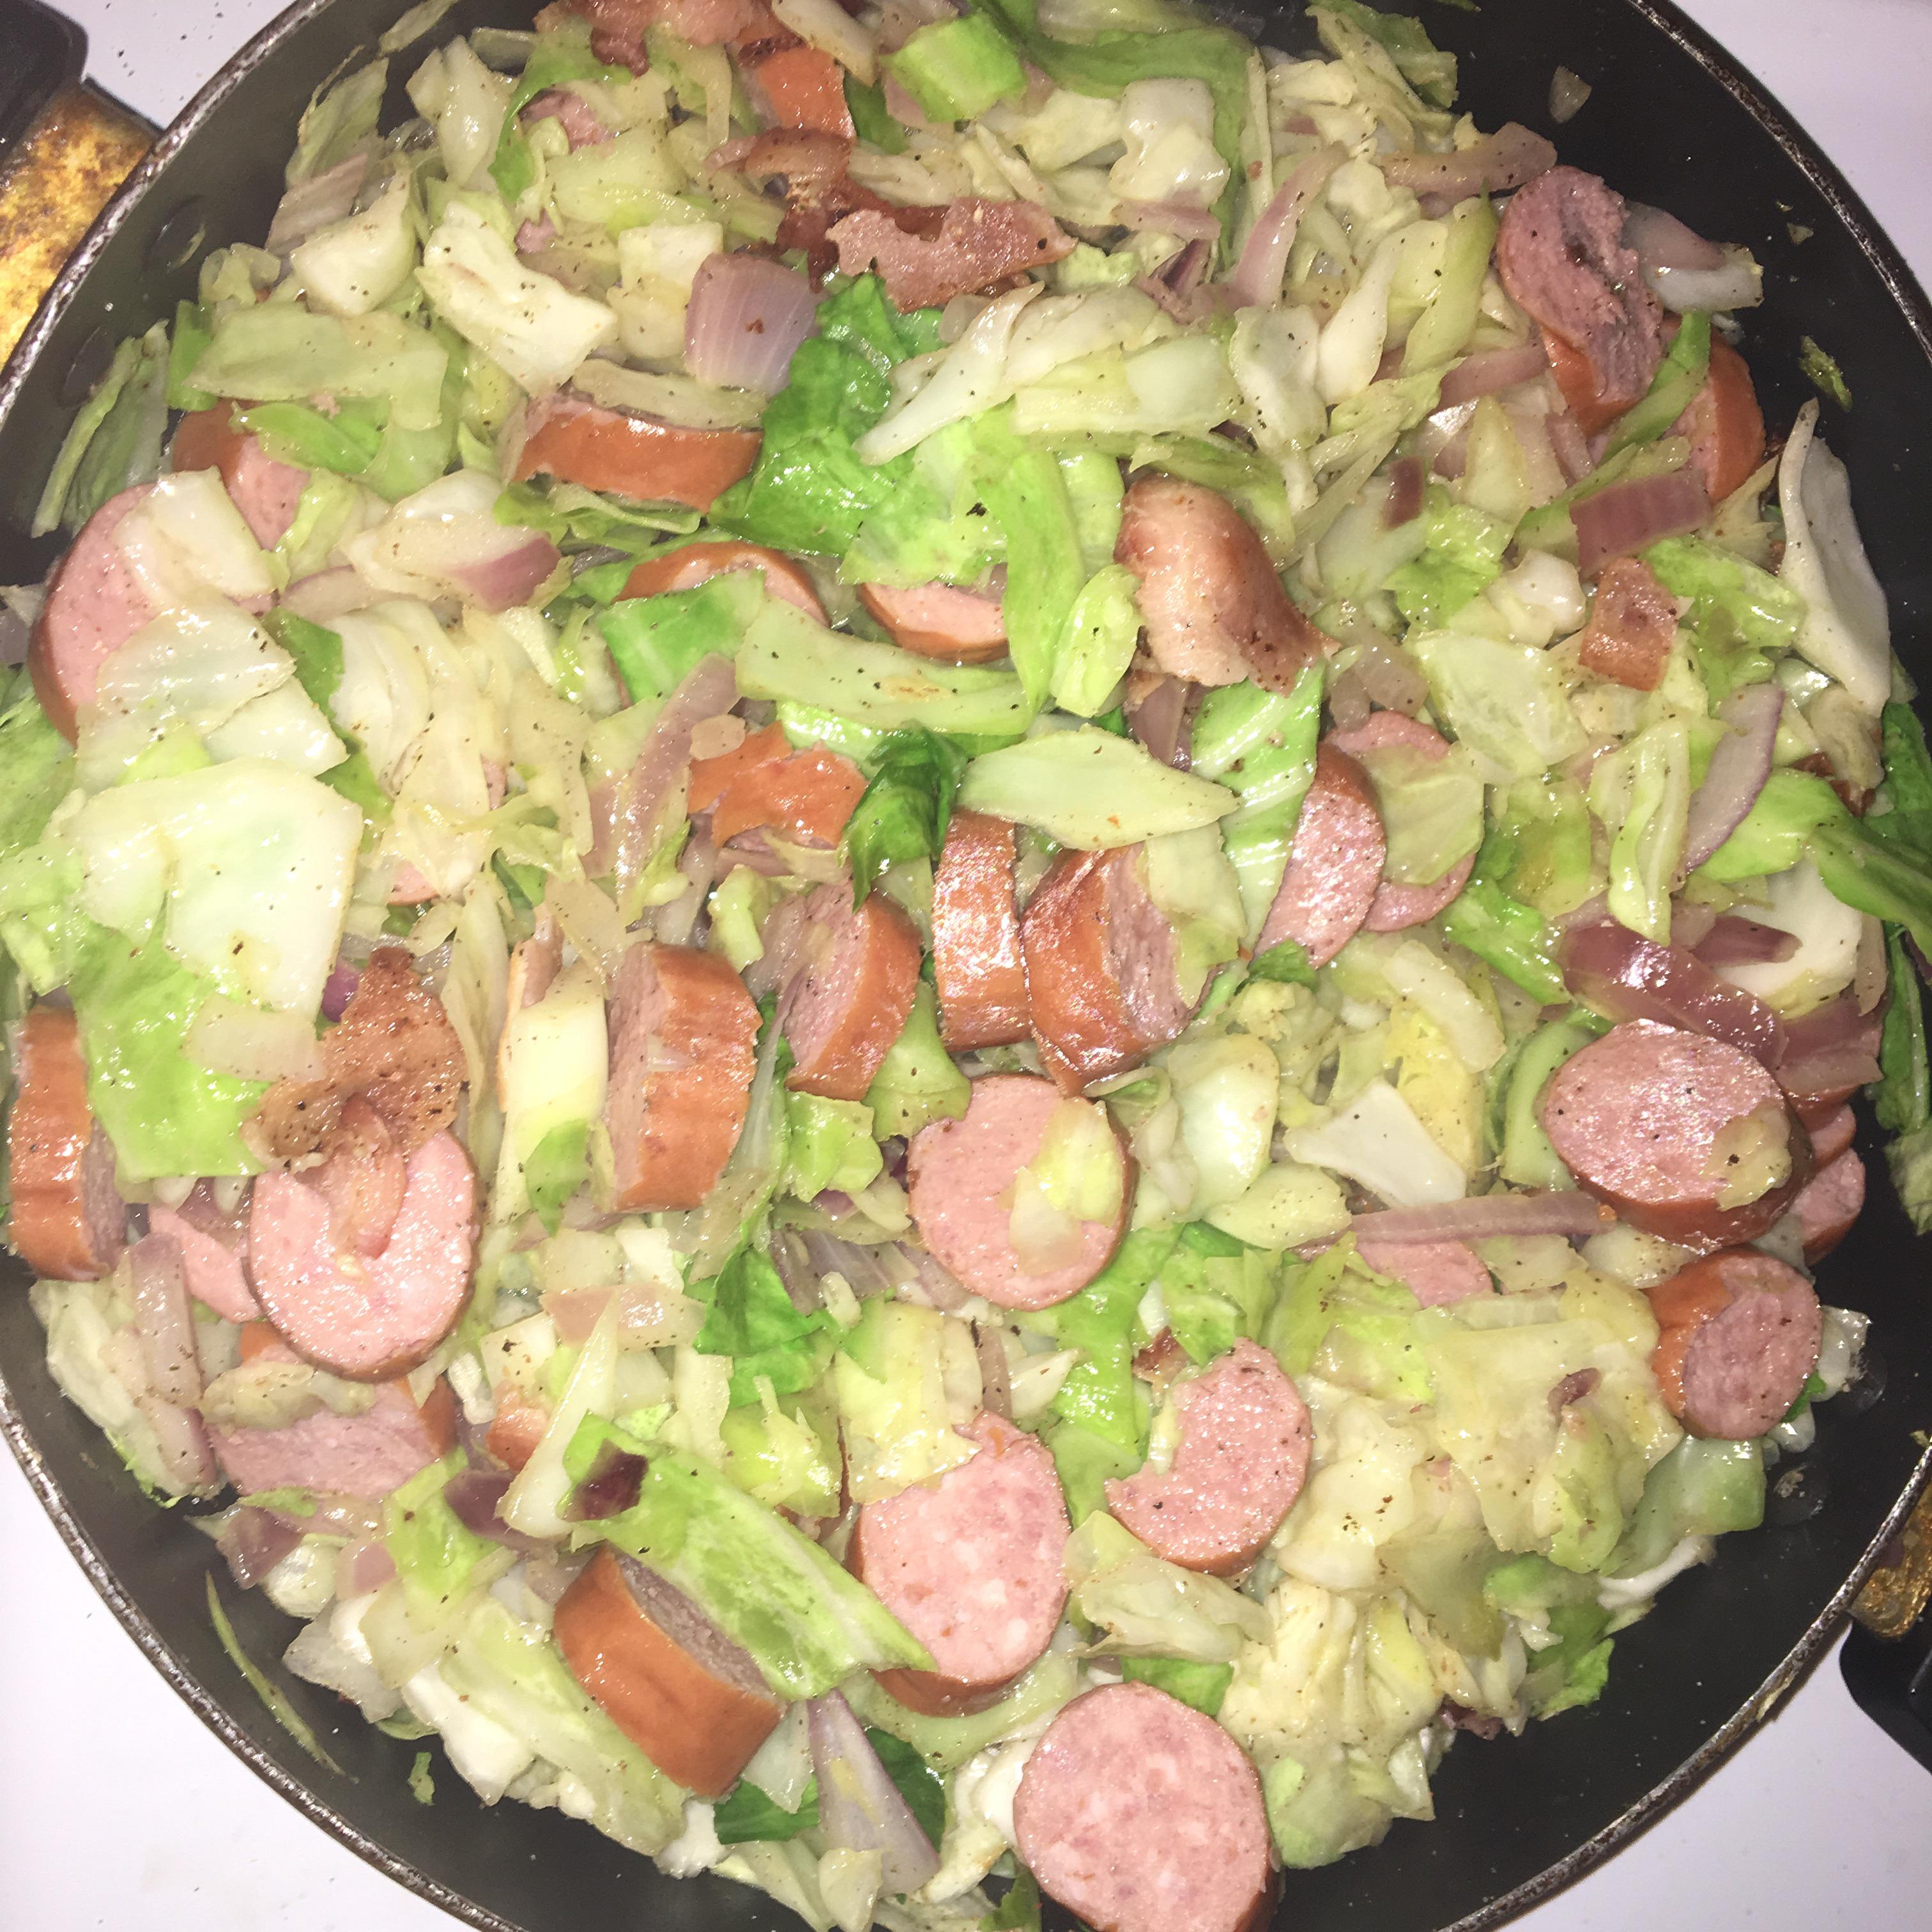 Fried Cabbage and Kielbasa